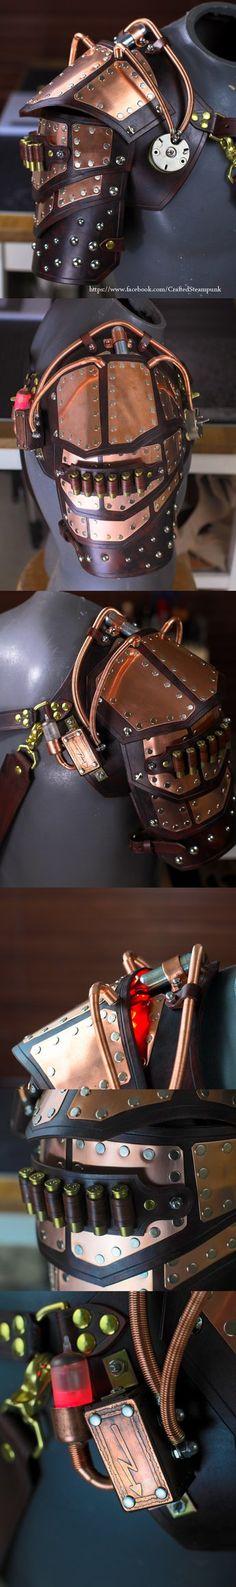 Steampunk, Powered Pauldron by CraftedSteampunk on DeviantArt